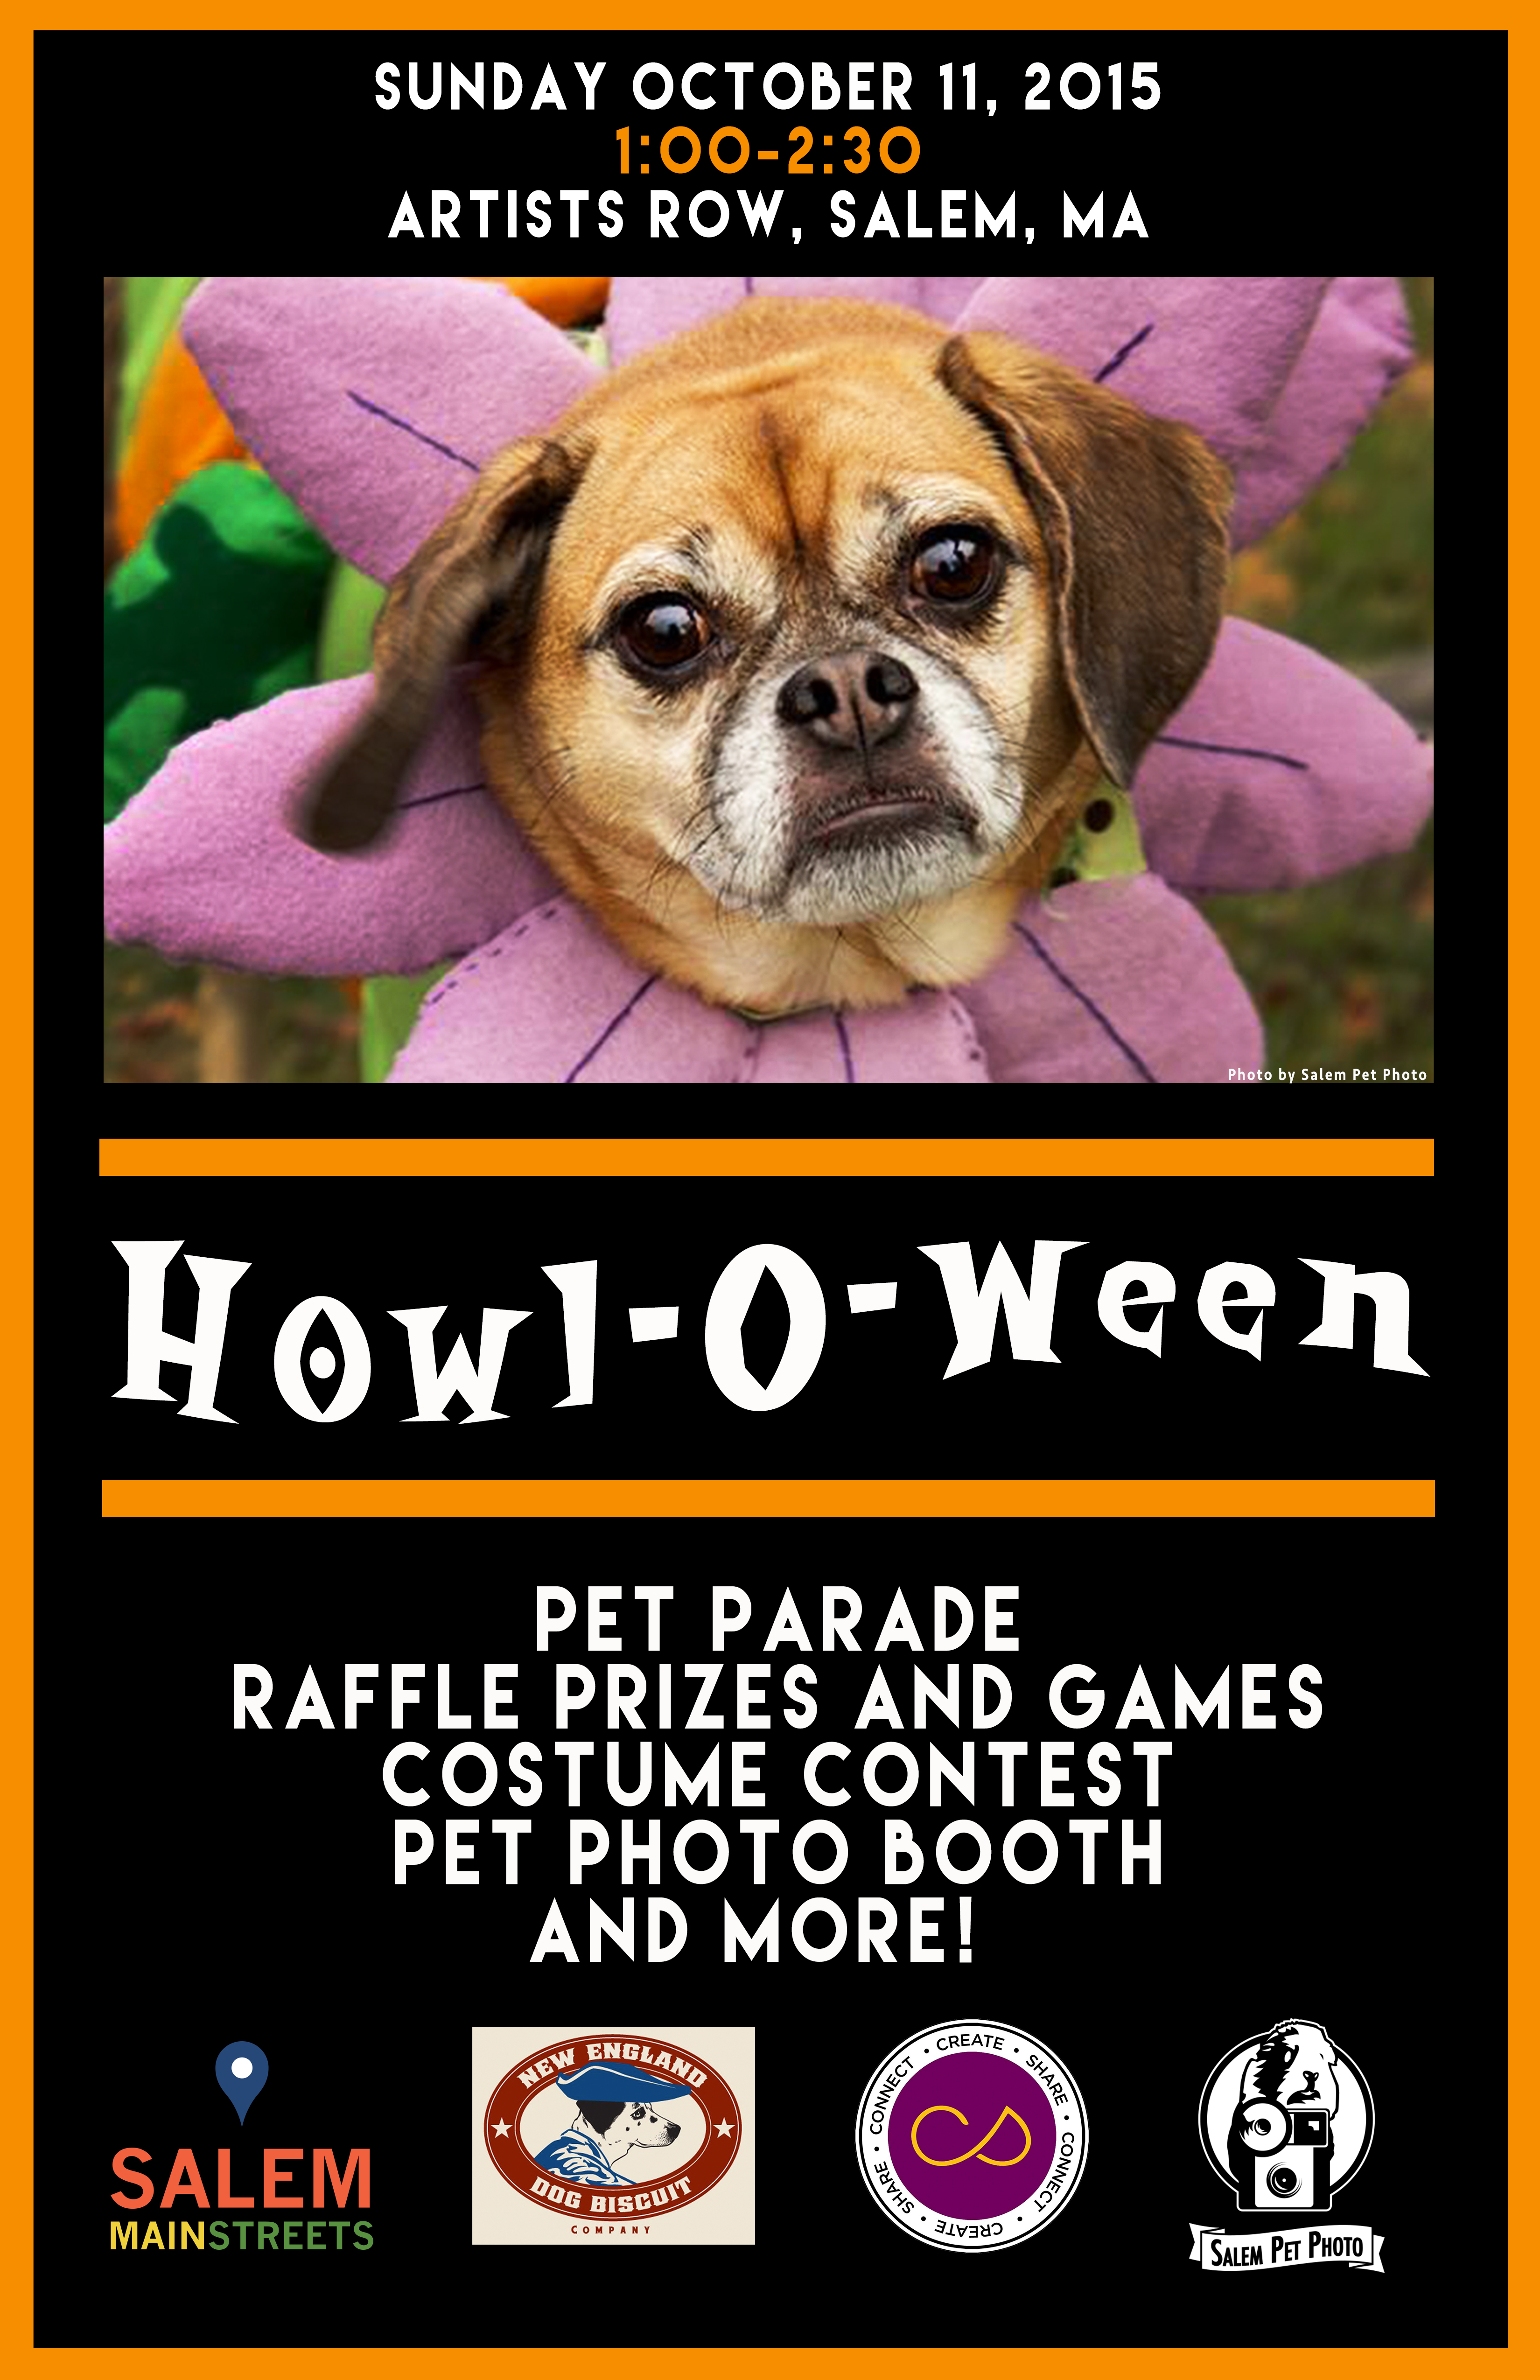 howl-o-weenv2